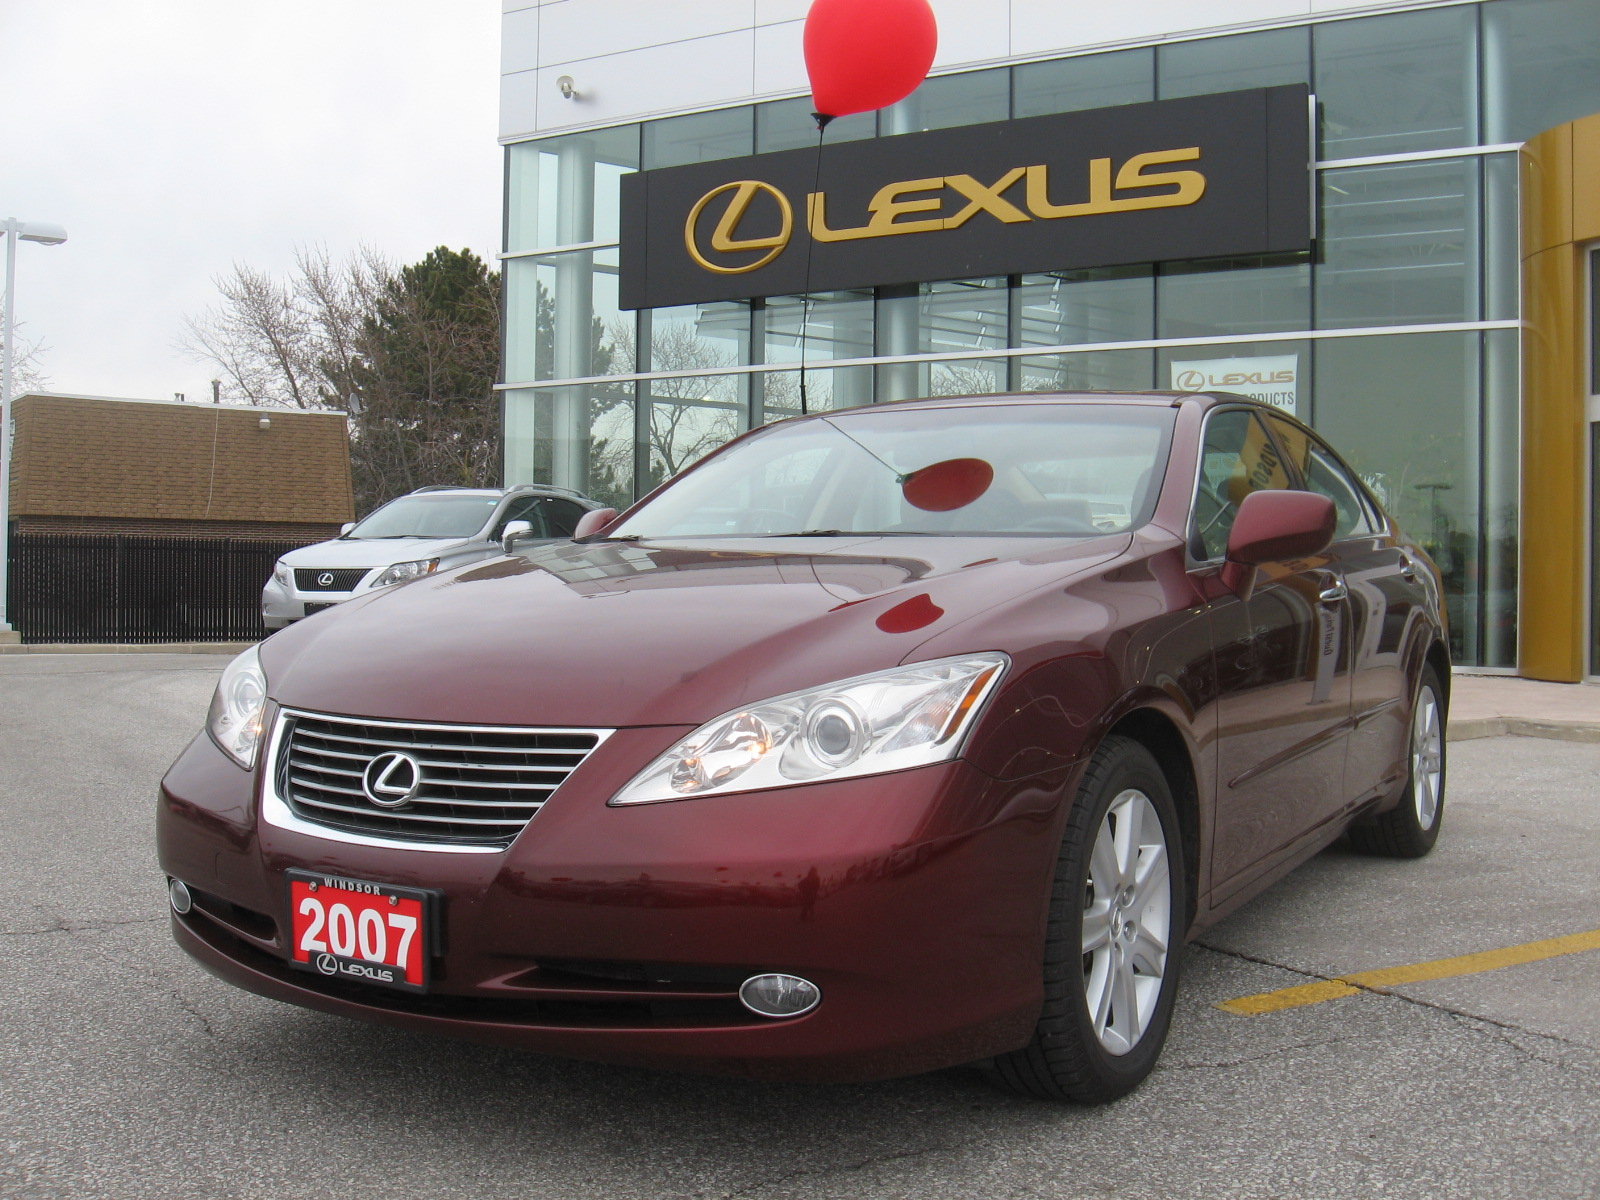 Used Lexus ES 350 for sale Pre owned Lexus ES 350 for sale